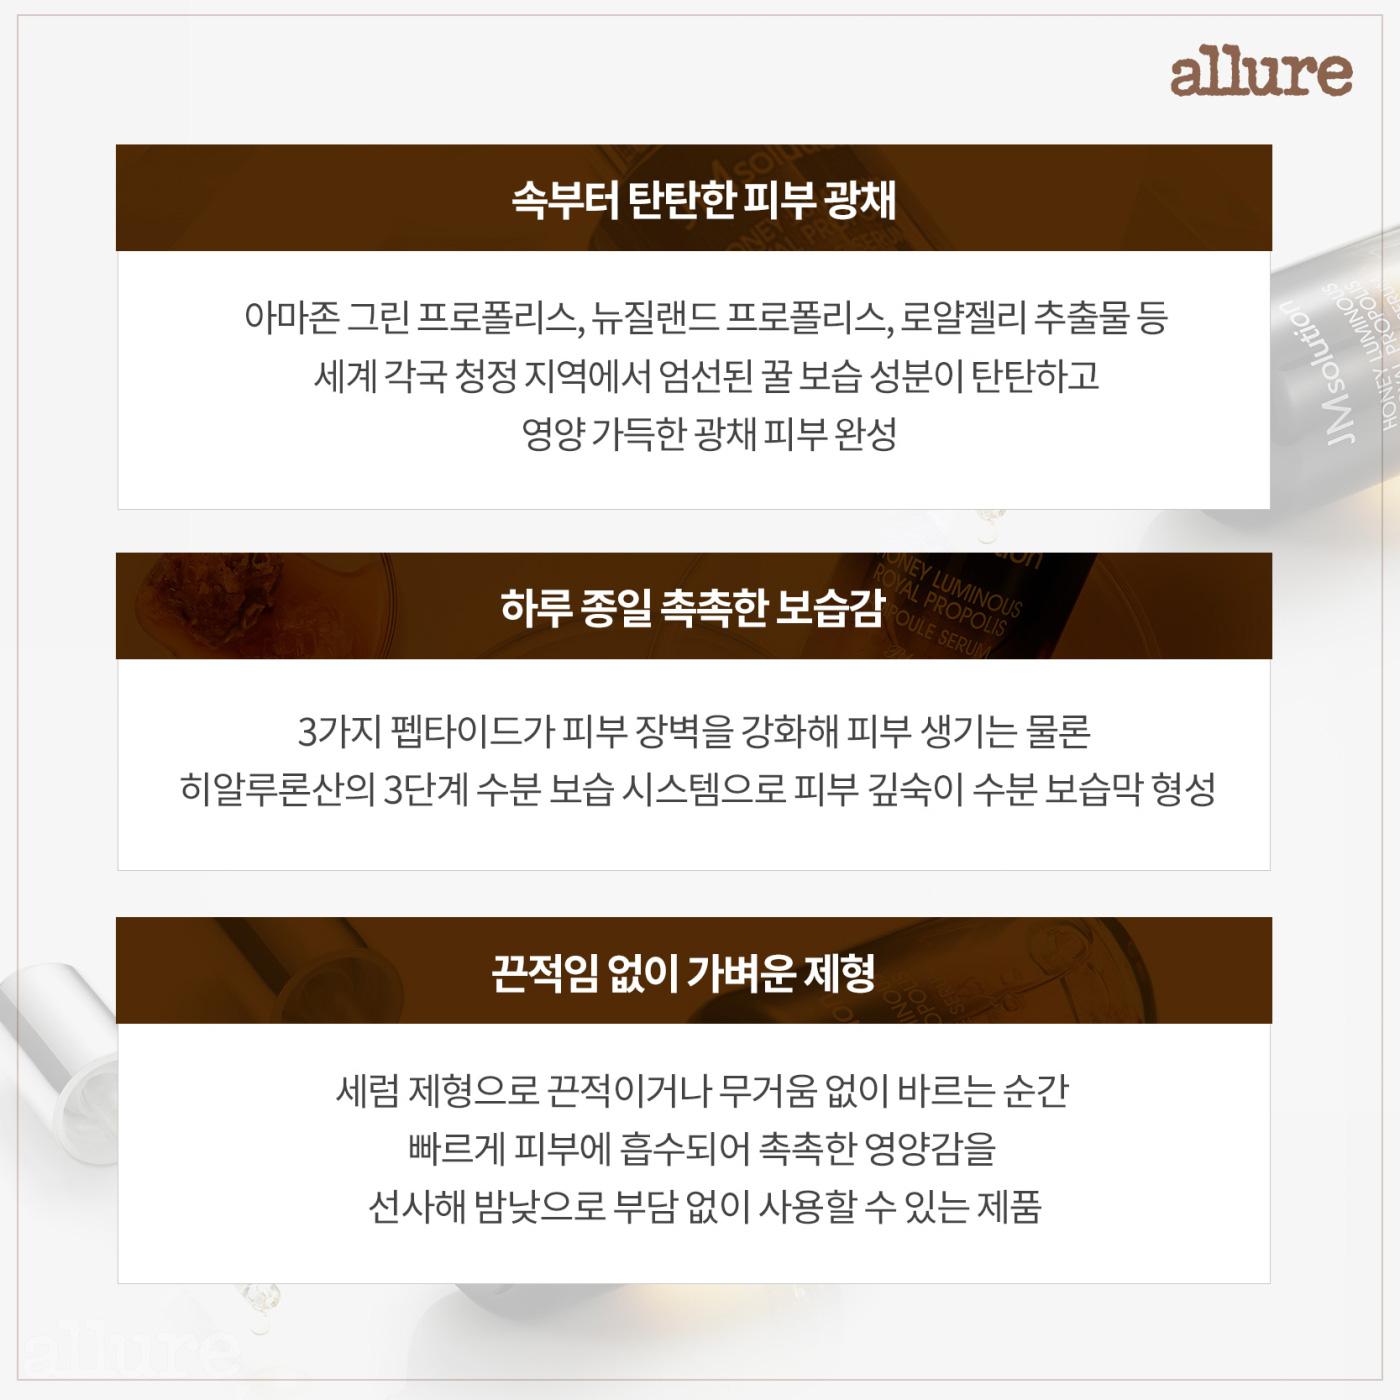 JM솔루션_카드뉴스_3